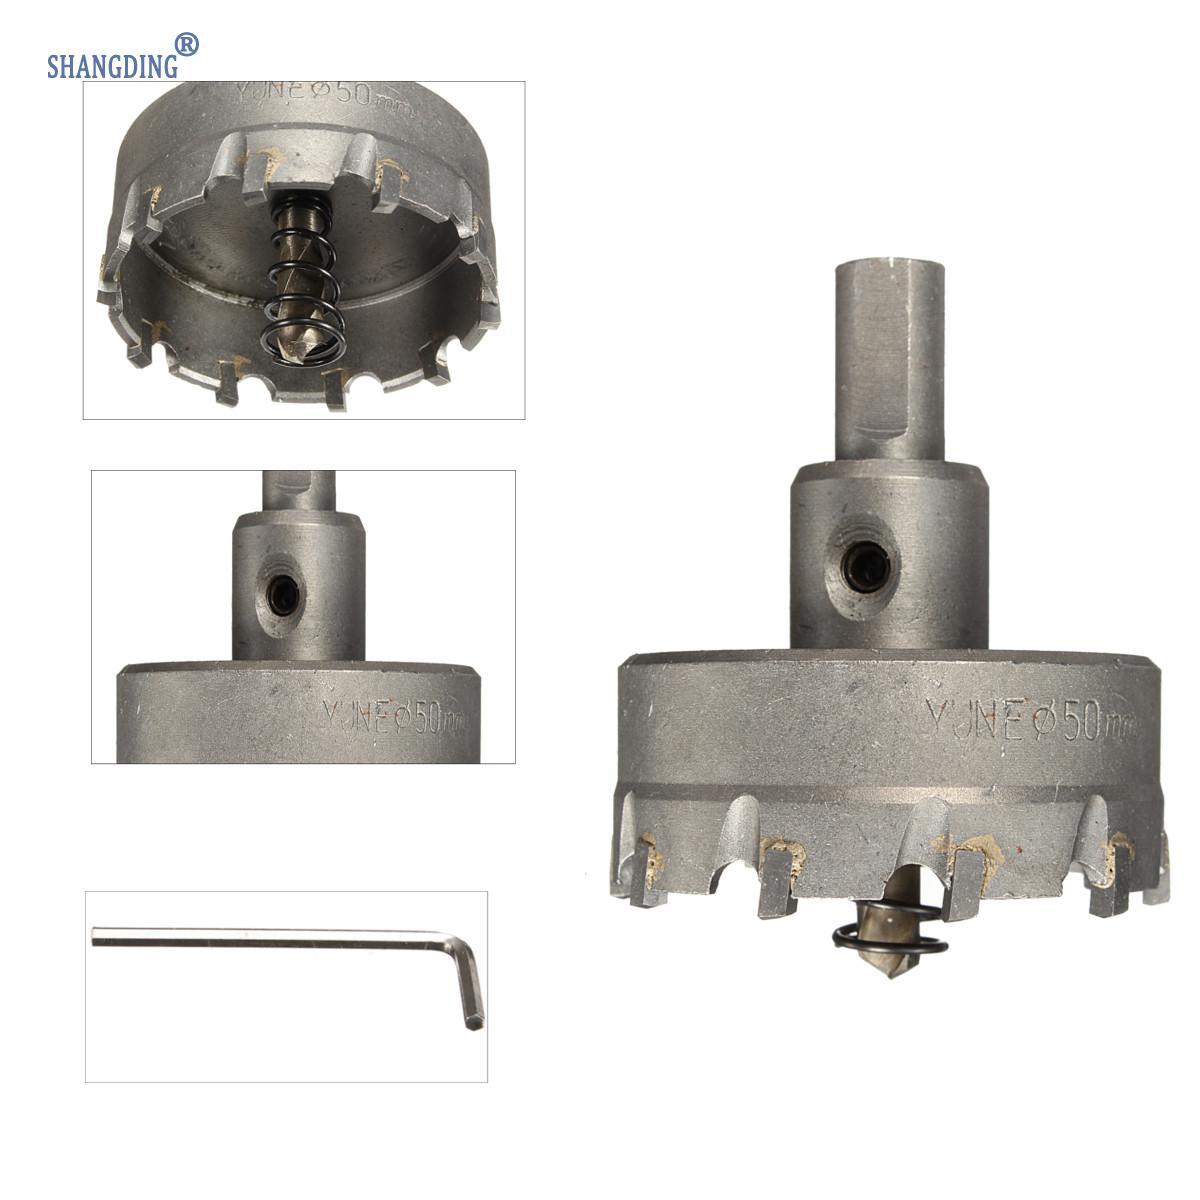 1 set punta in metallo duro da 48 mm TCT punta da trapano per metallo - Punta da trapano - Fotografia 1